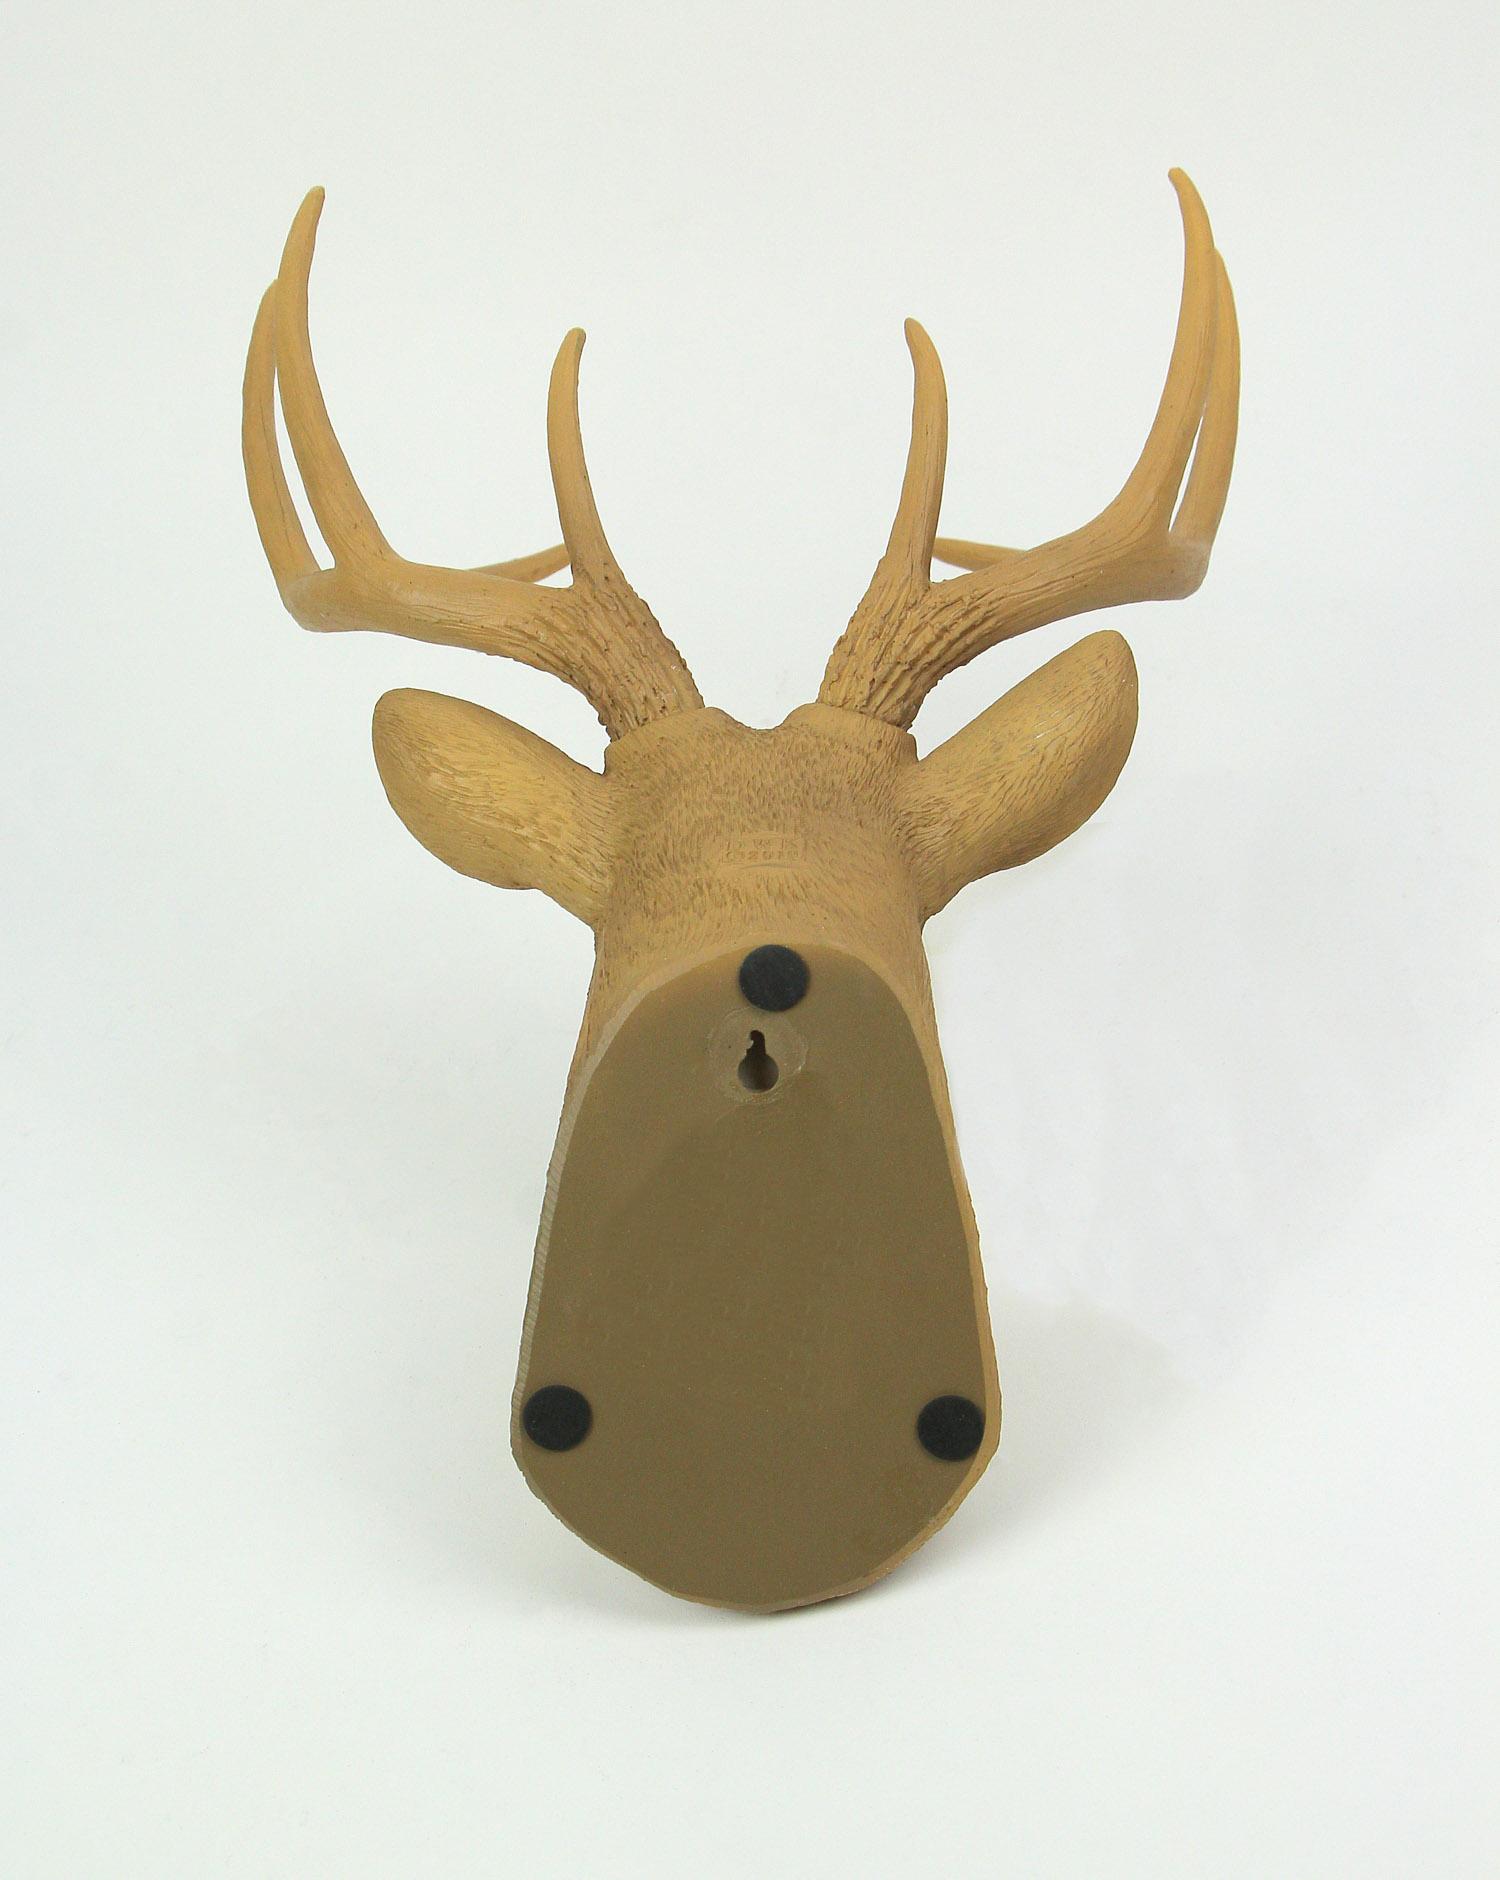 thumbnail 4 - Deer Head Buck Horns Wall Mounted Antler Trophy Faux Taxidermy Sculpture